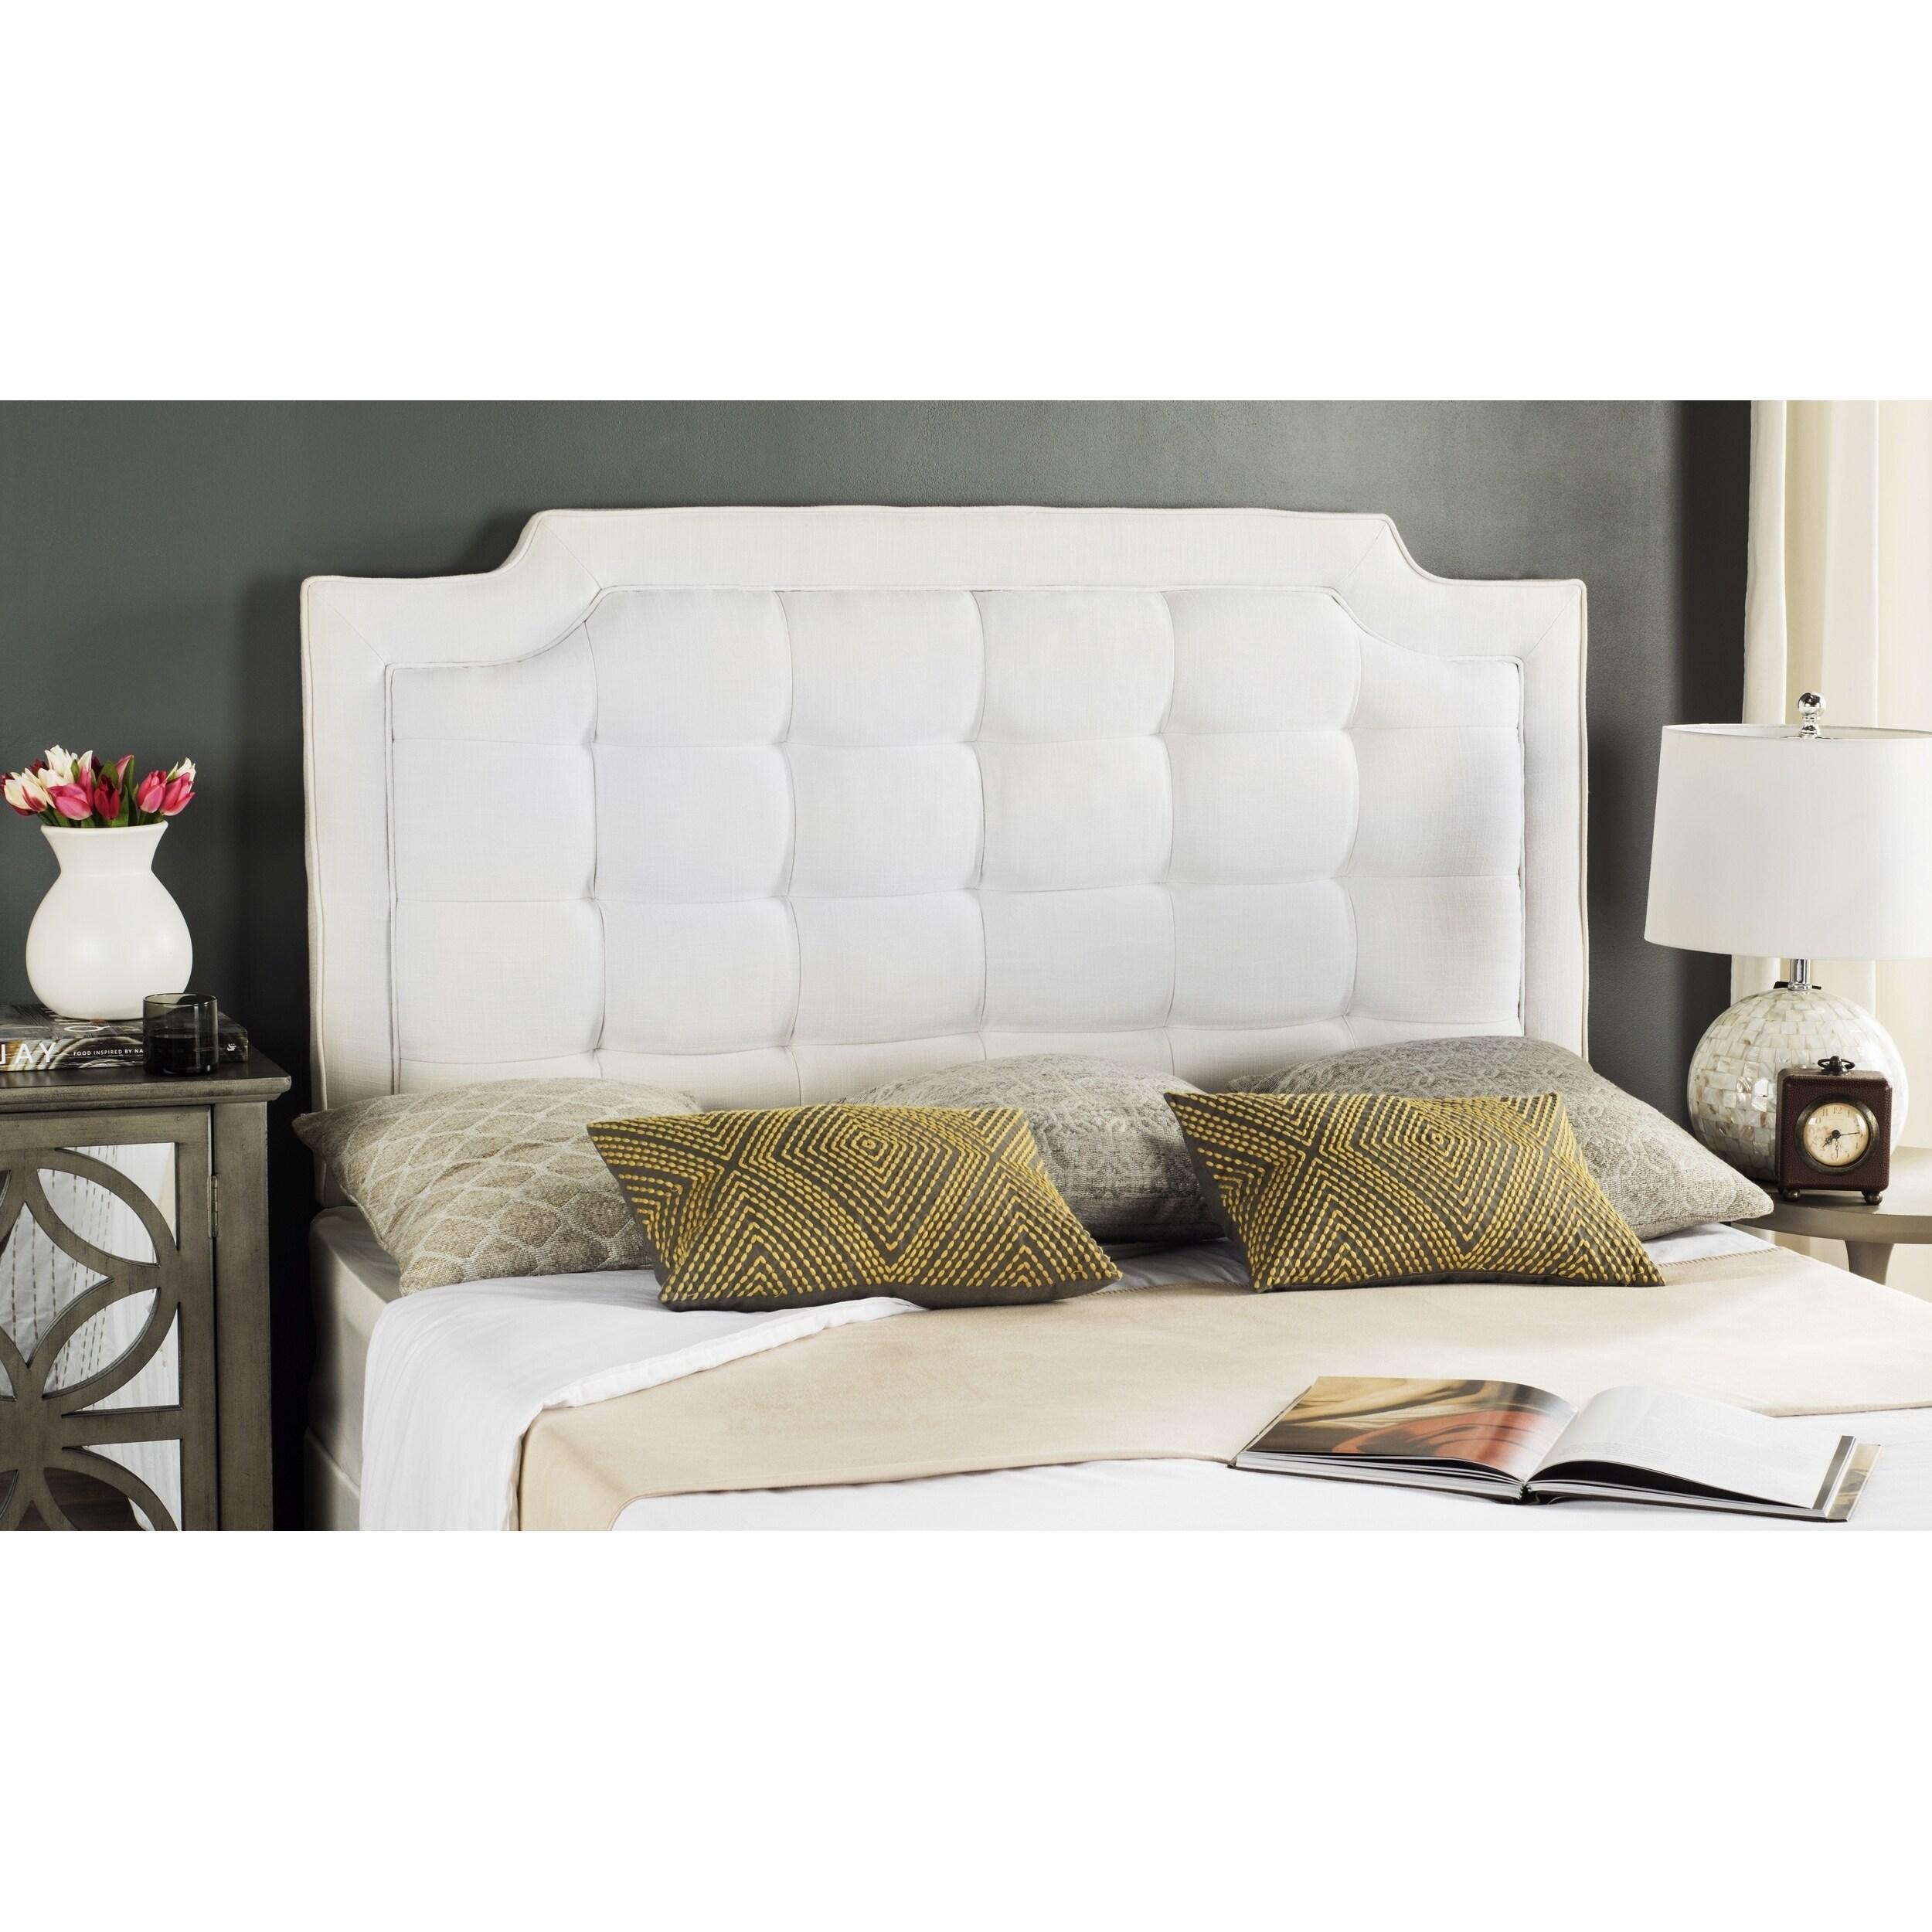 Safavieh Saphire Light Grey Upholstered Tufted Headboard (Full)